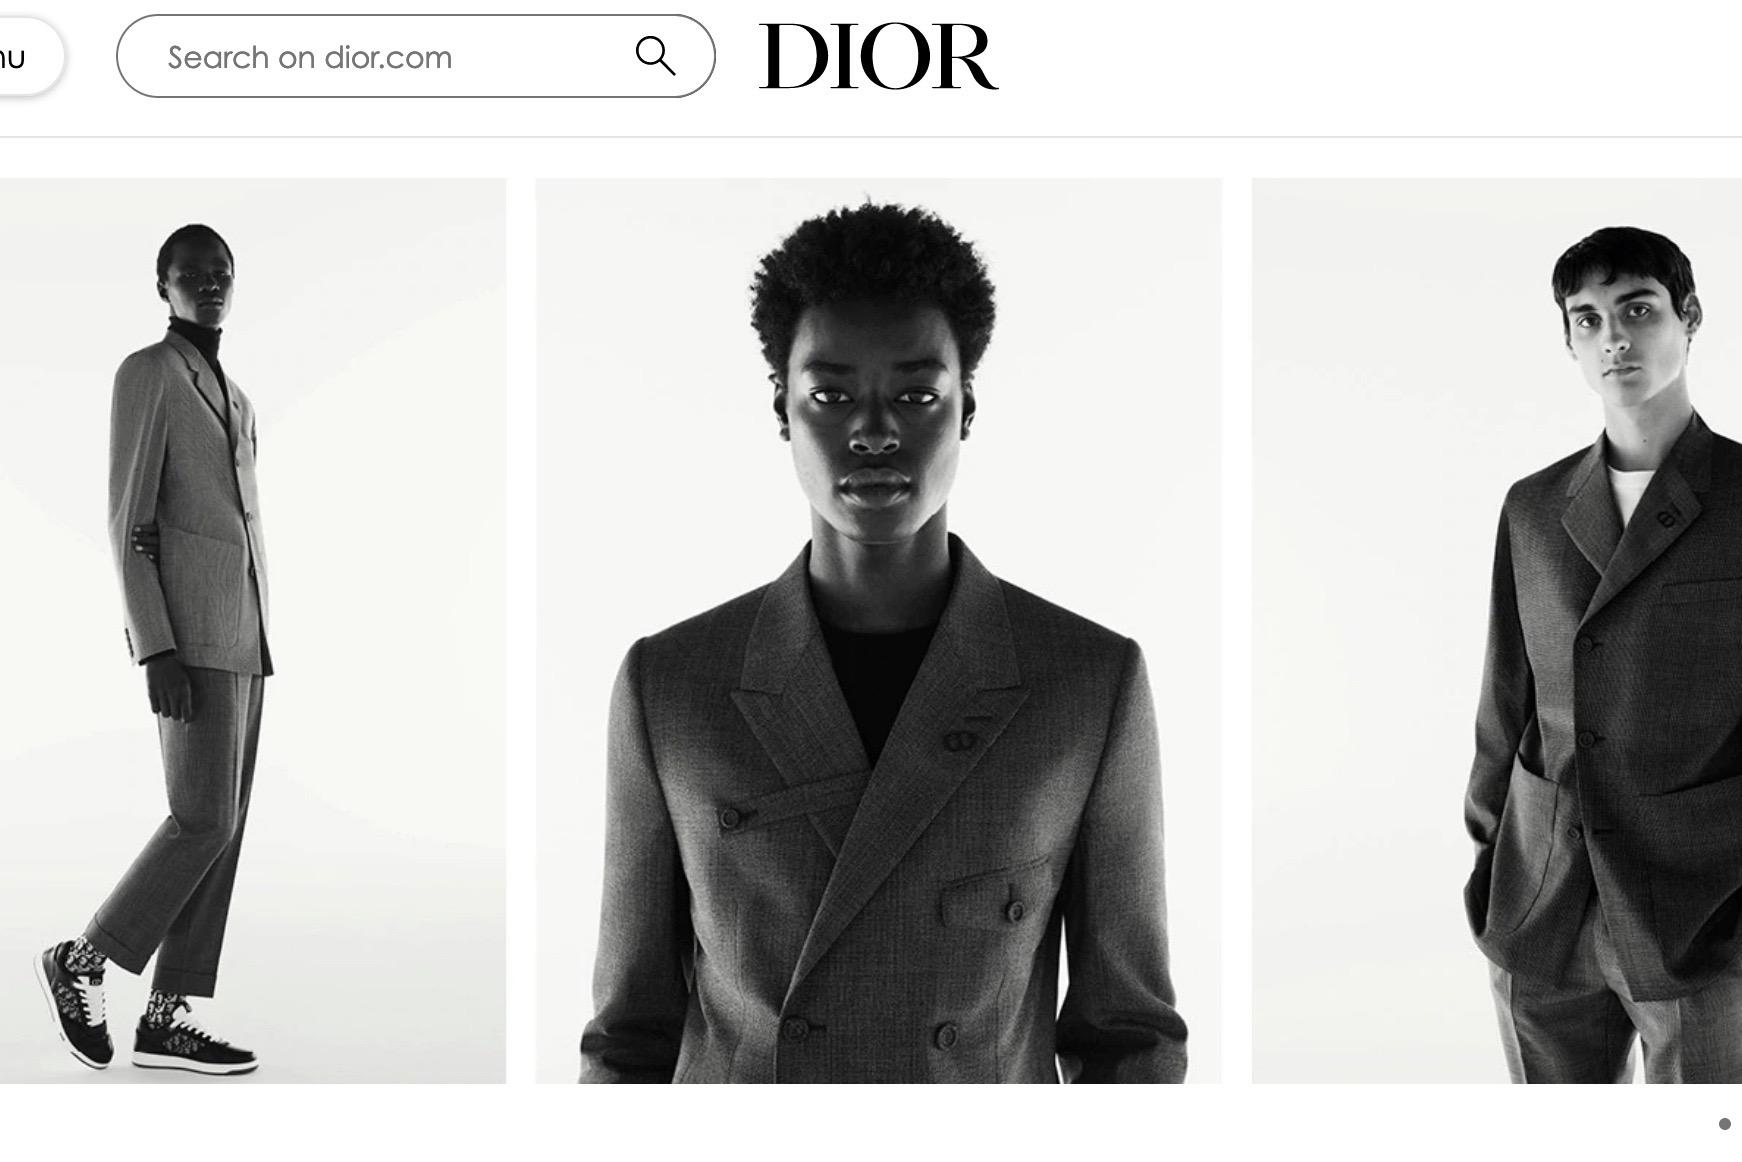 Dior 男装创意总监 Kim Jones 宣布:下月将在北京举办新一季发布活动